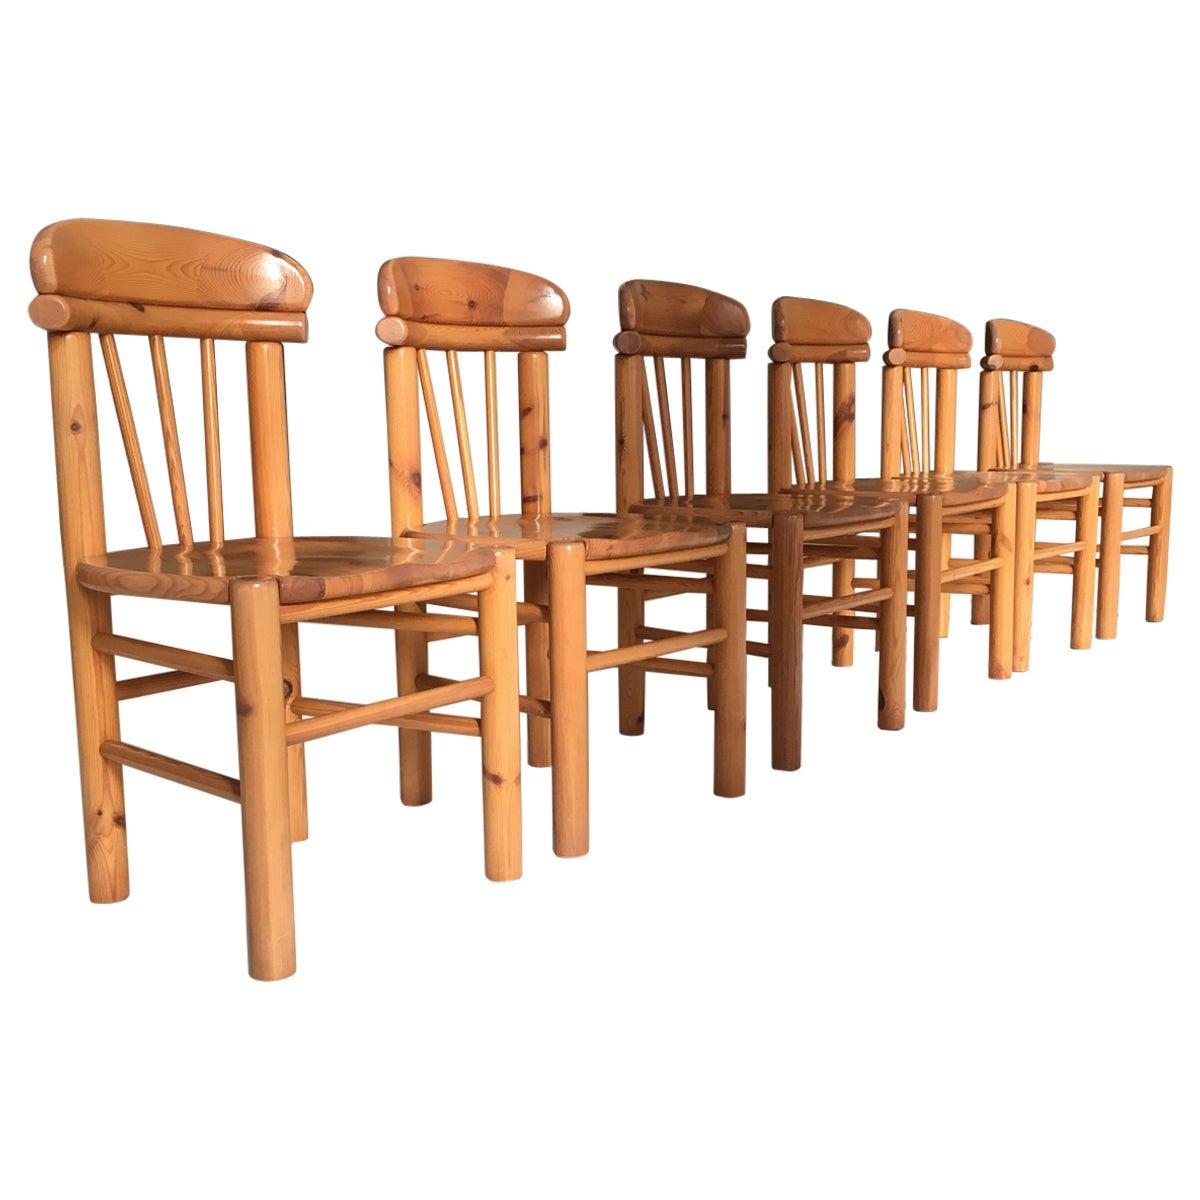 Pine Dining Chairs Rainer Daumiller Set of Six, Denmark, 1970